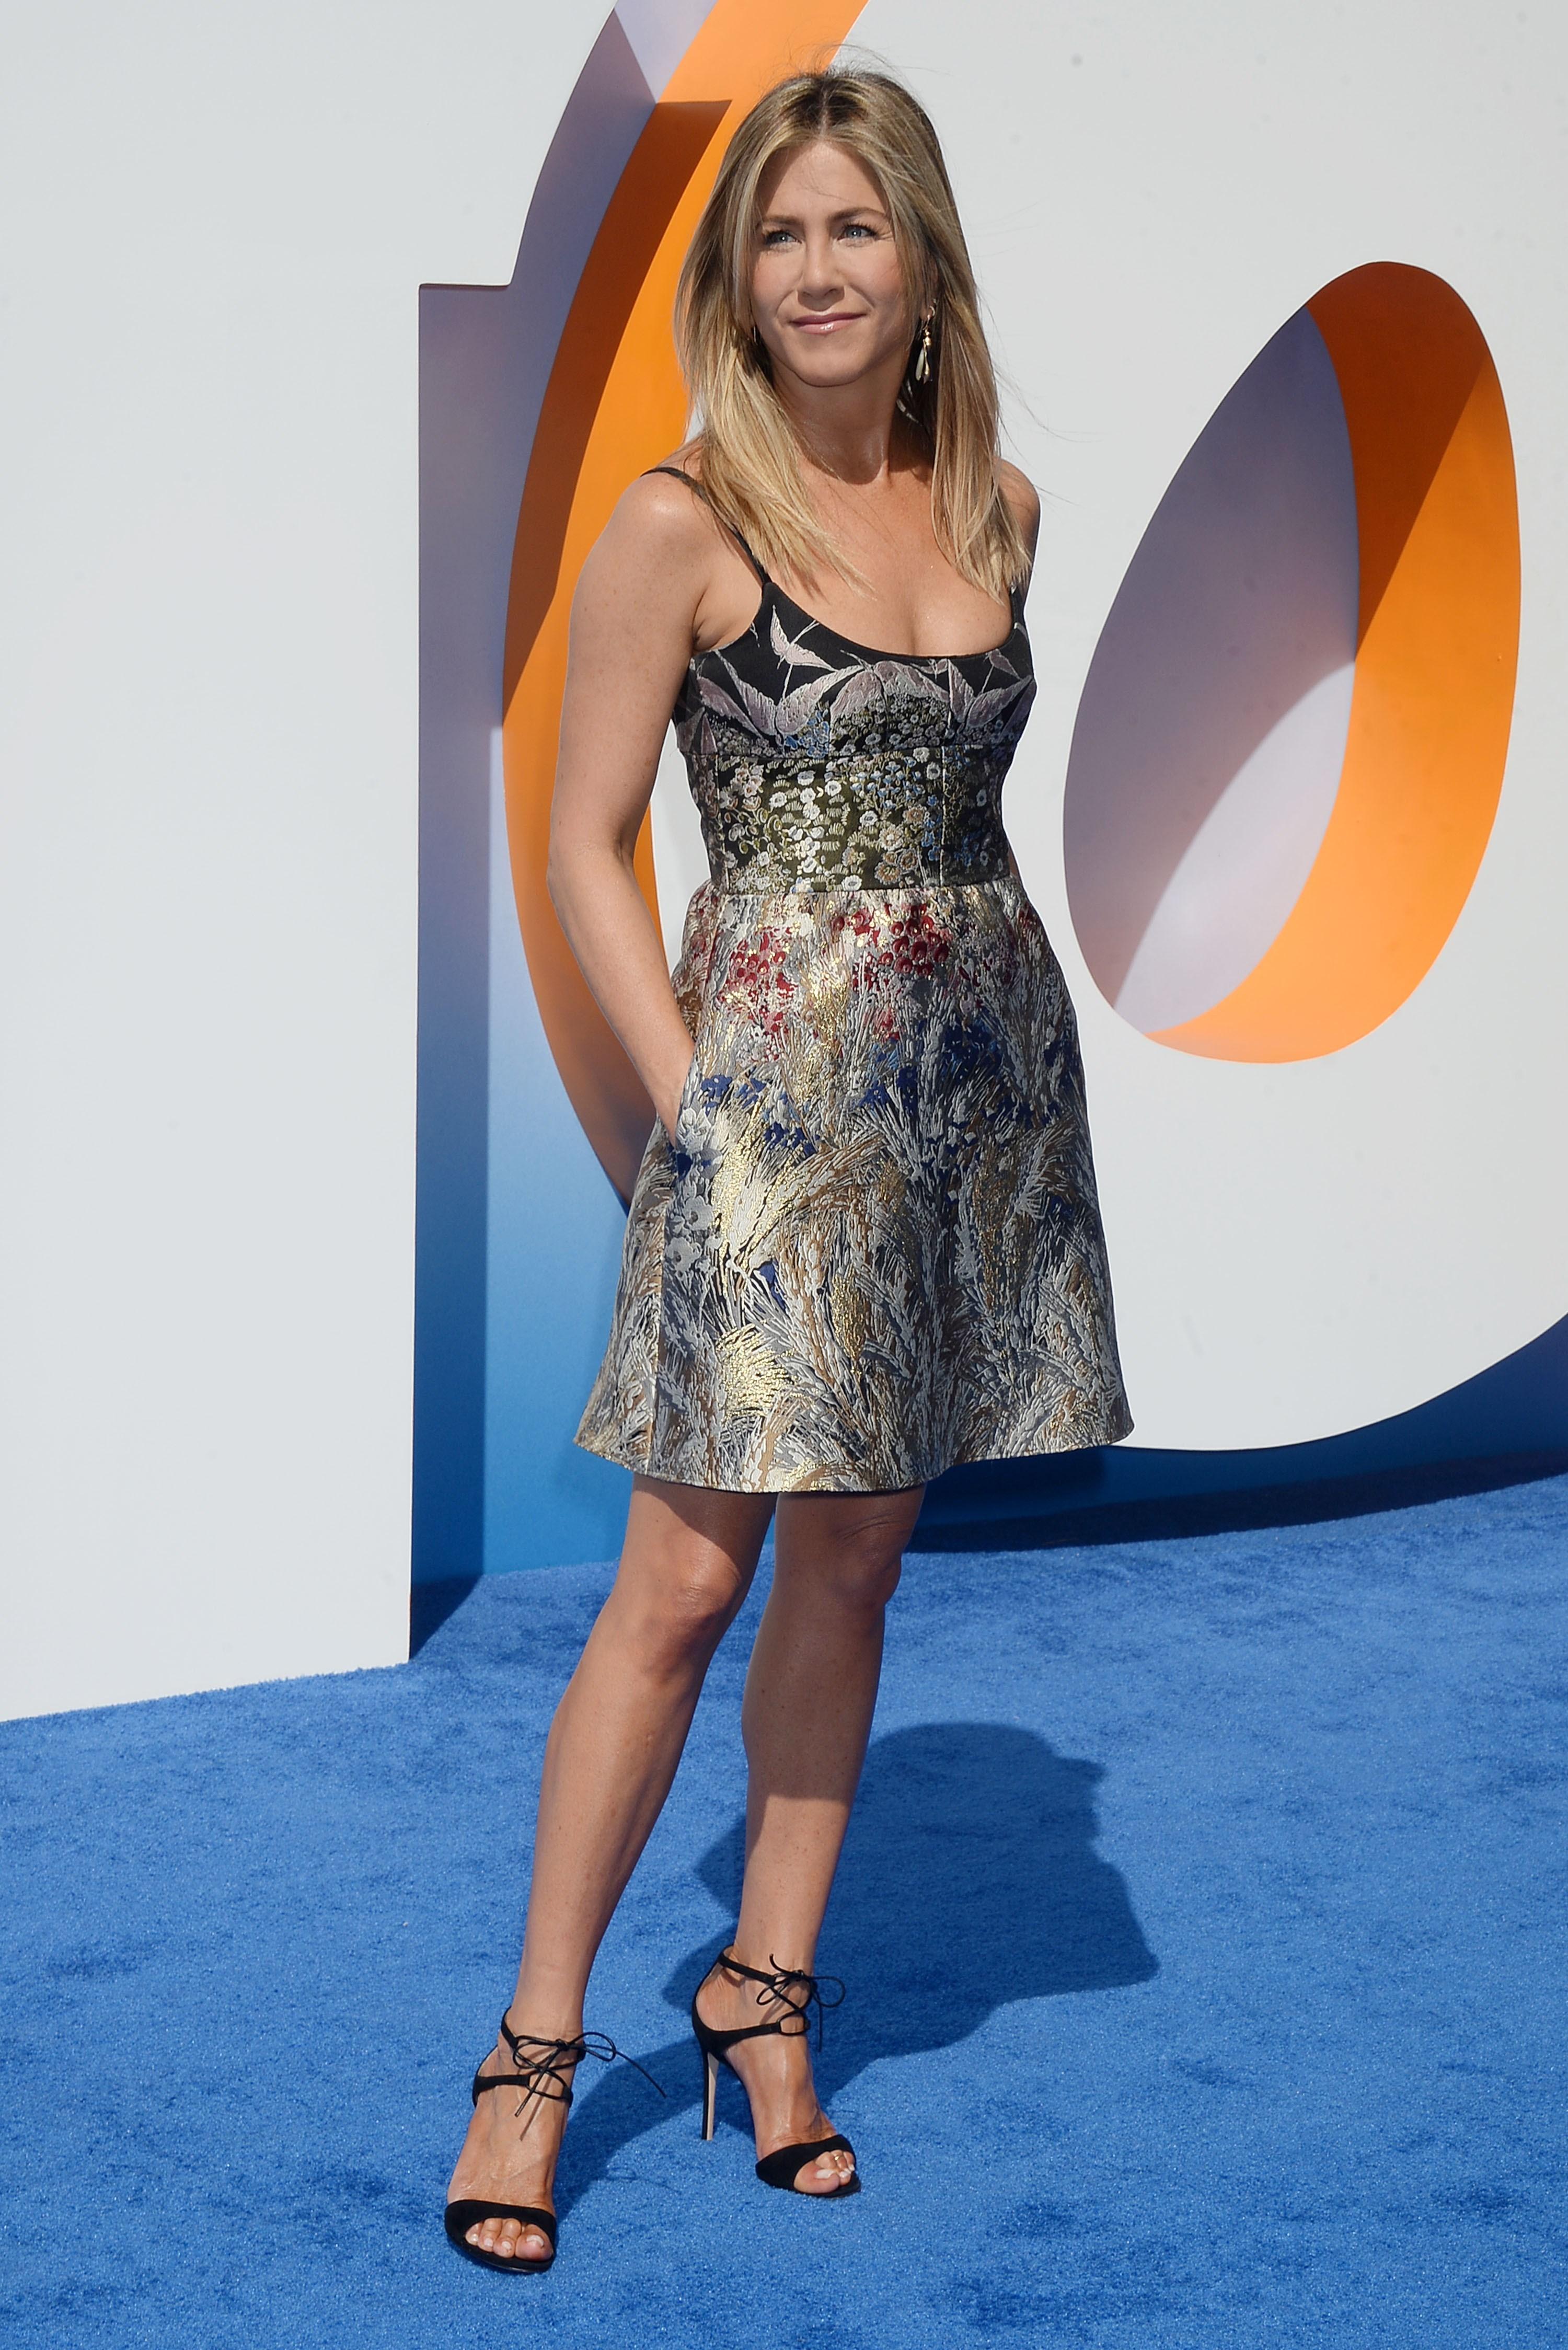 Adoption rumor No. 5 million hits Jennifer Aniston